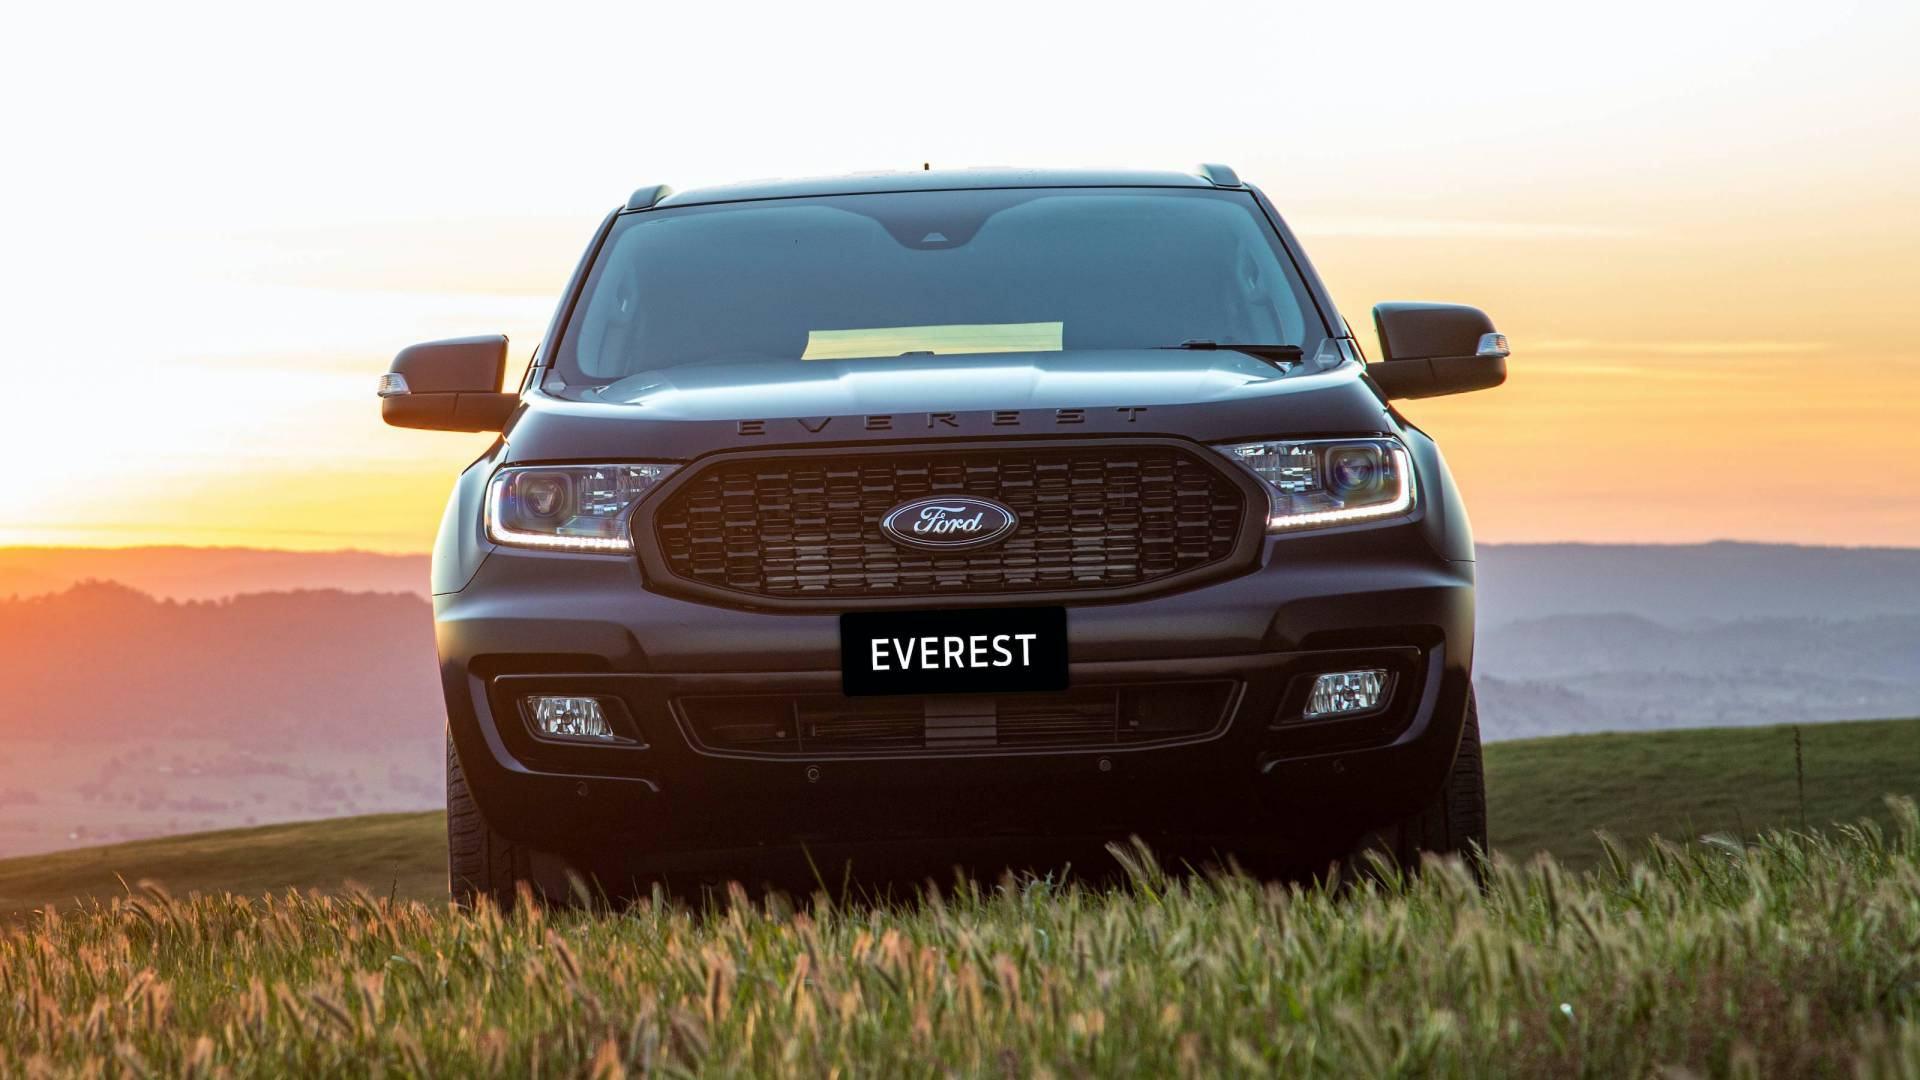 2021 ford everest sport australia spec 5 - Chi tiết Ford Everest Sport 2021 – Phiên bản thể thao cho phái mạnh